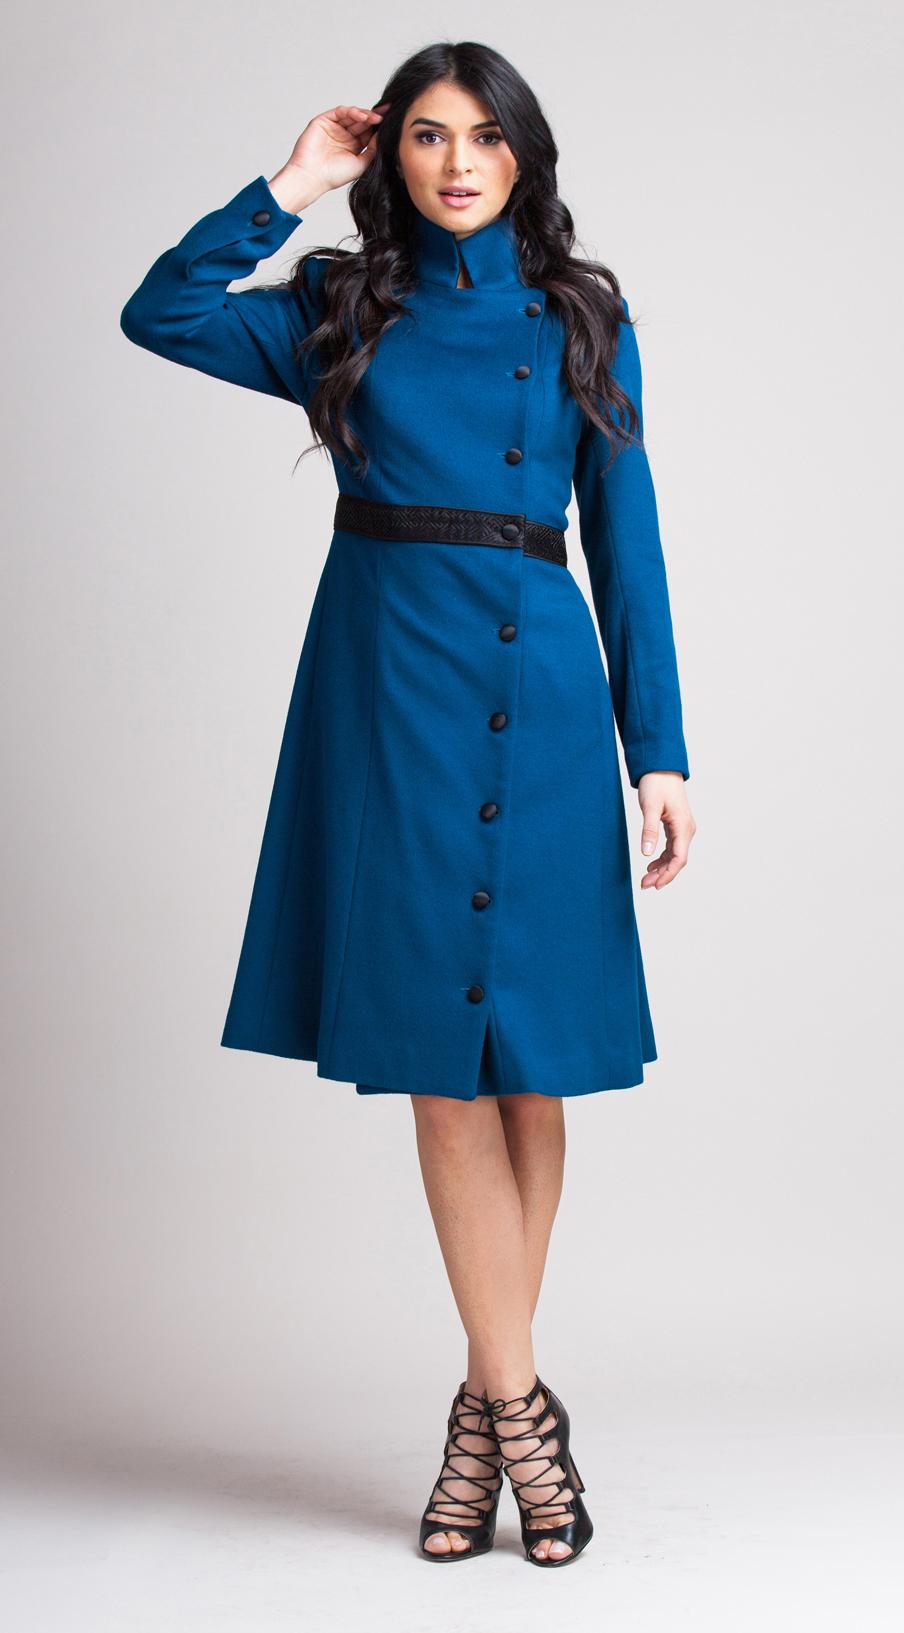 Teal-Azurean-Teresa-Crowninshield-Cashmere-Angora-Wool-Silk-Overcoat-Belted-Lapel-Silk-LiningSilk-Lining-Belted-Lapel03.jpg